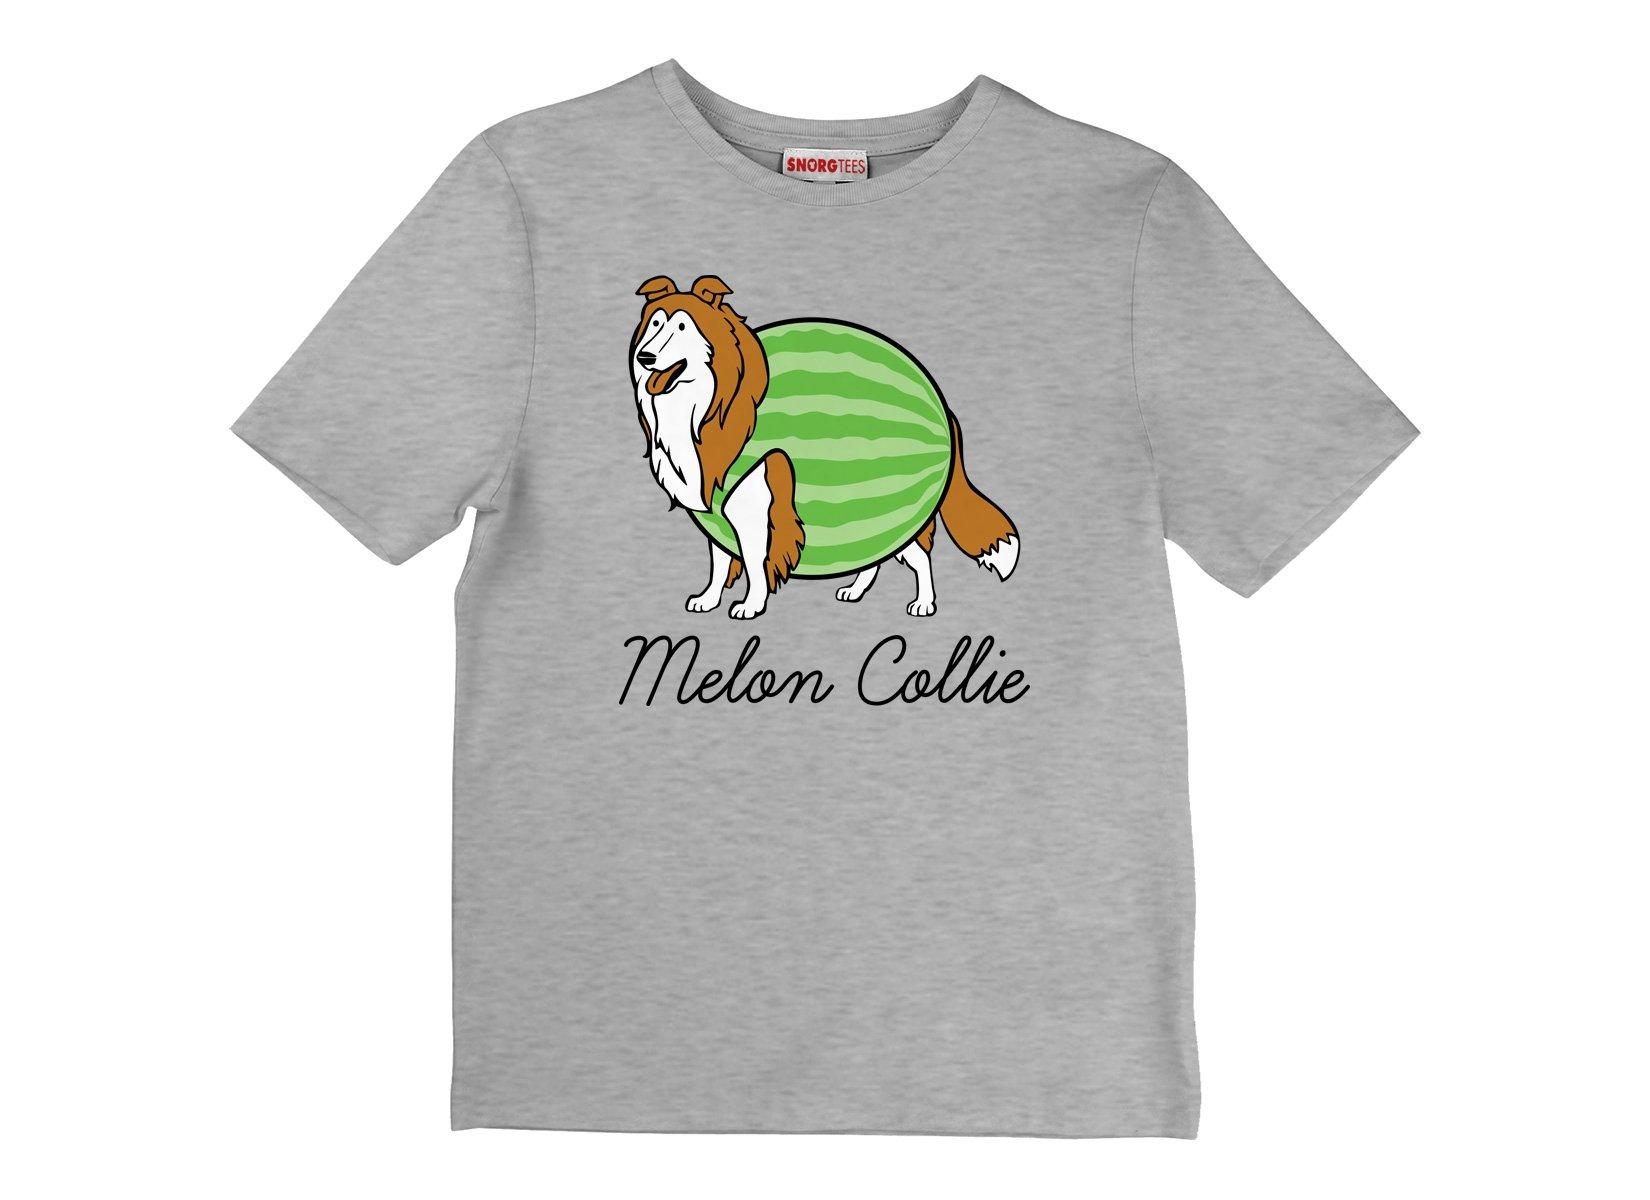 Melon Collie on Kids T-Shirt